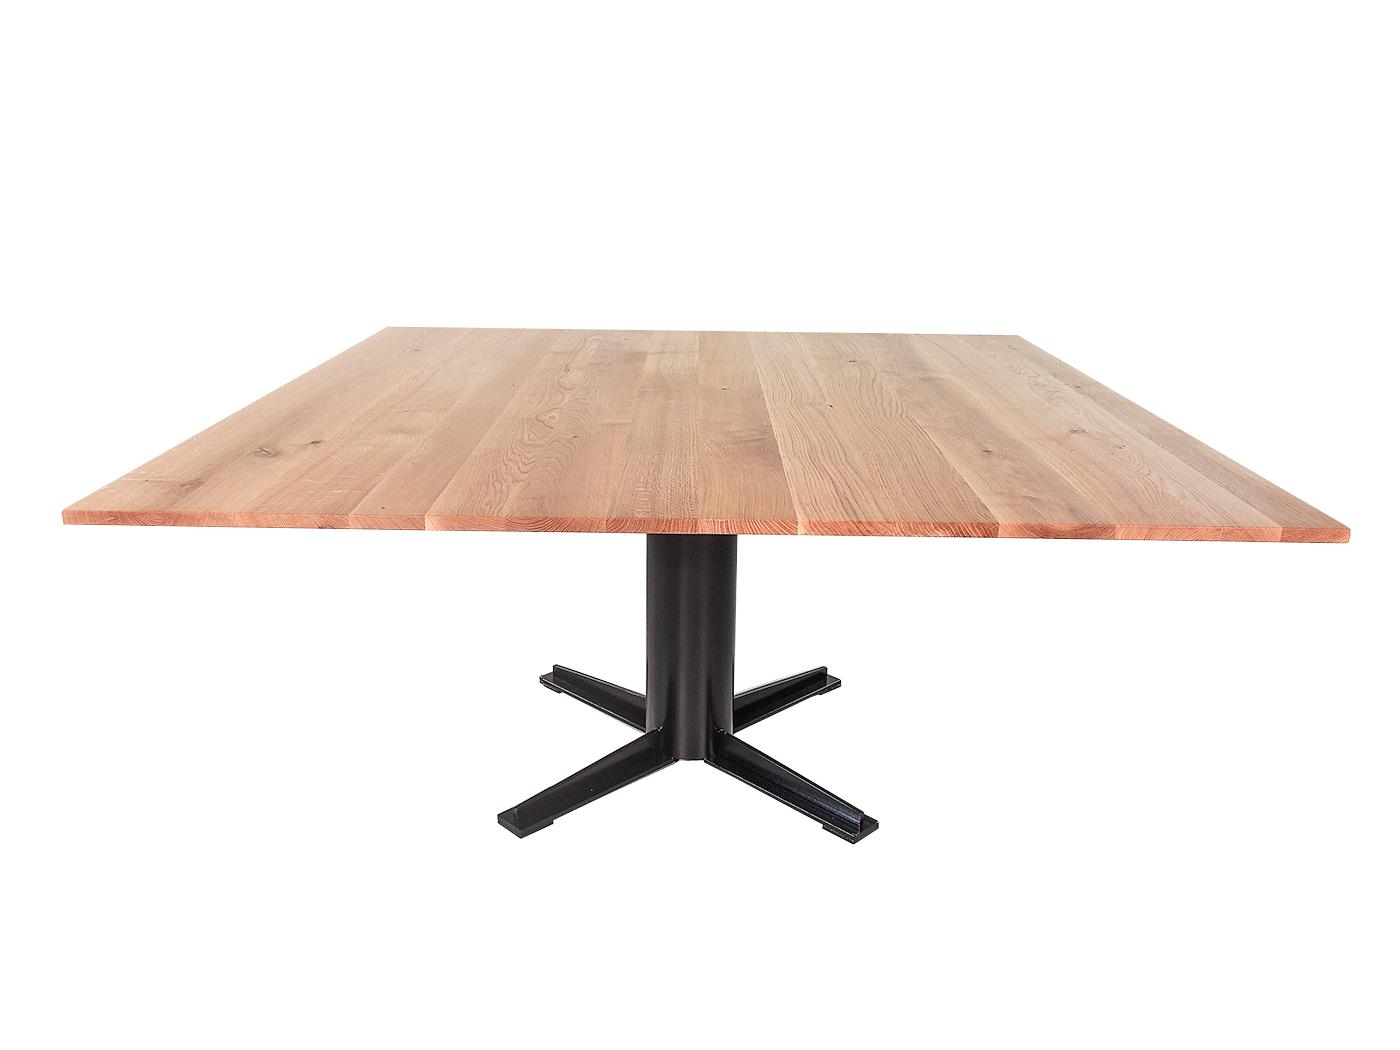 Nevada - Vierkante tafel 8 personen